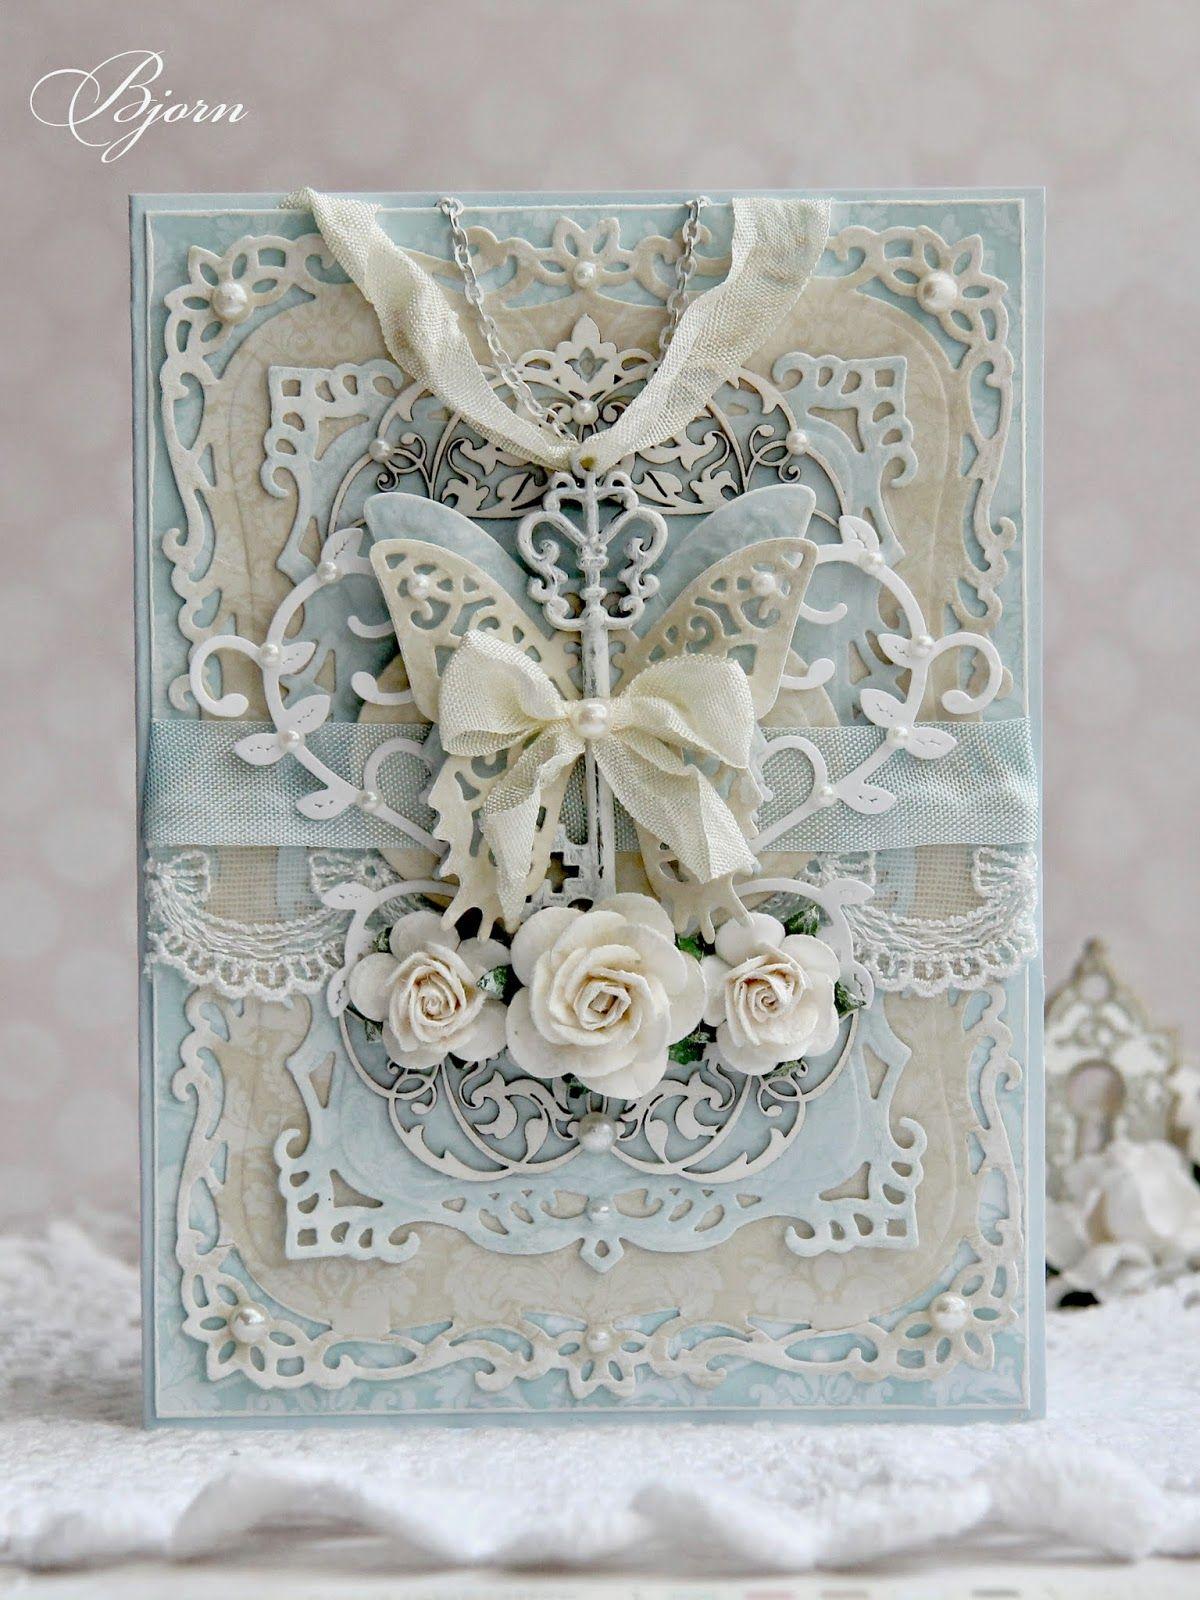 Pin by ronnel swetlik on cards shabby vintage pinterest flower